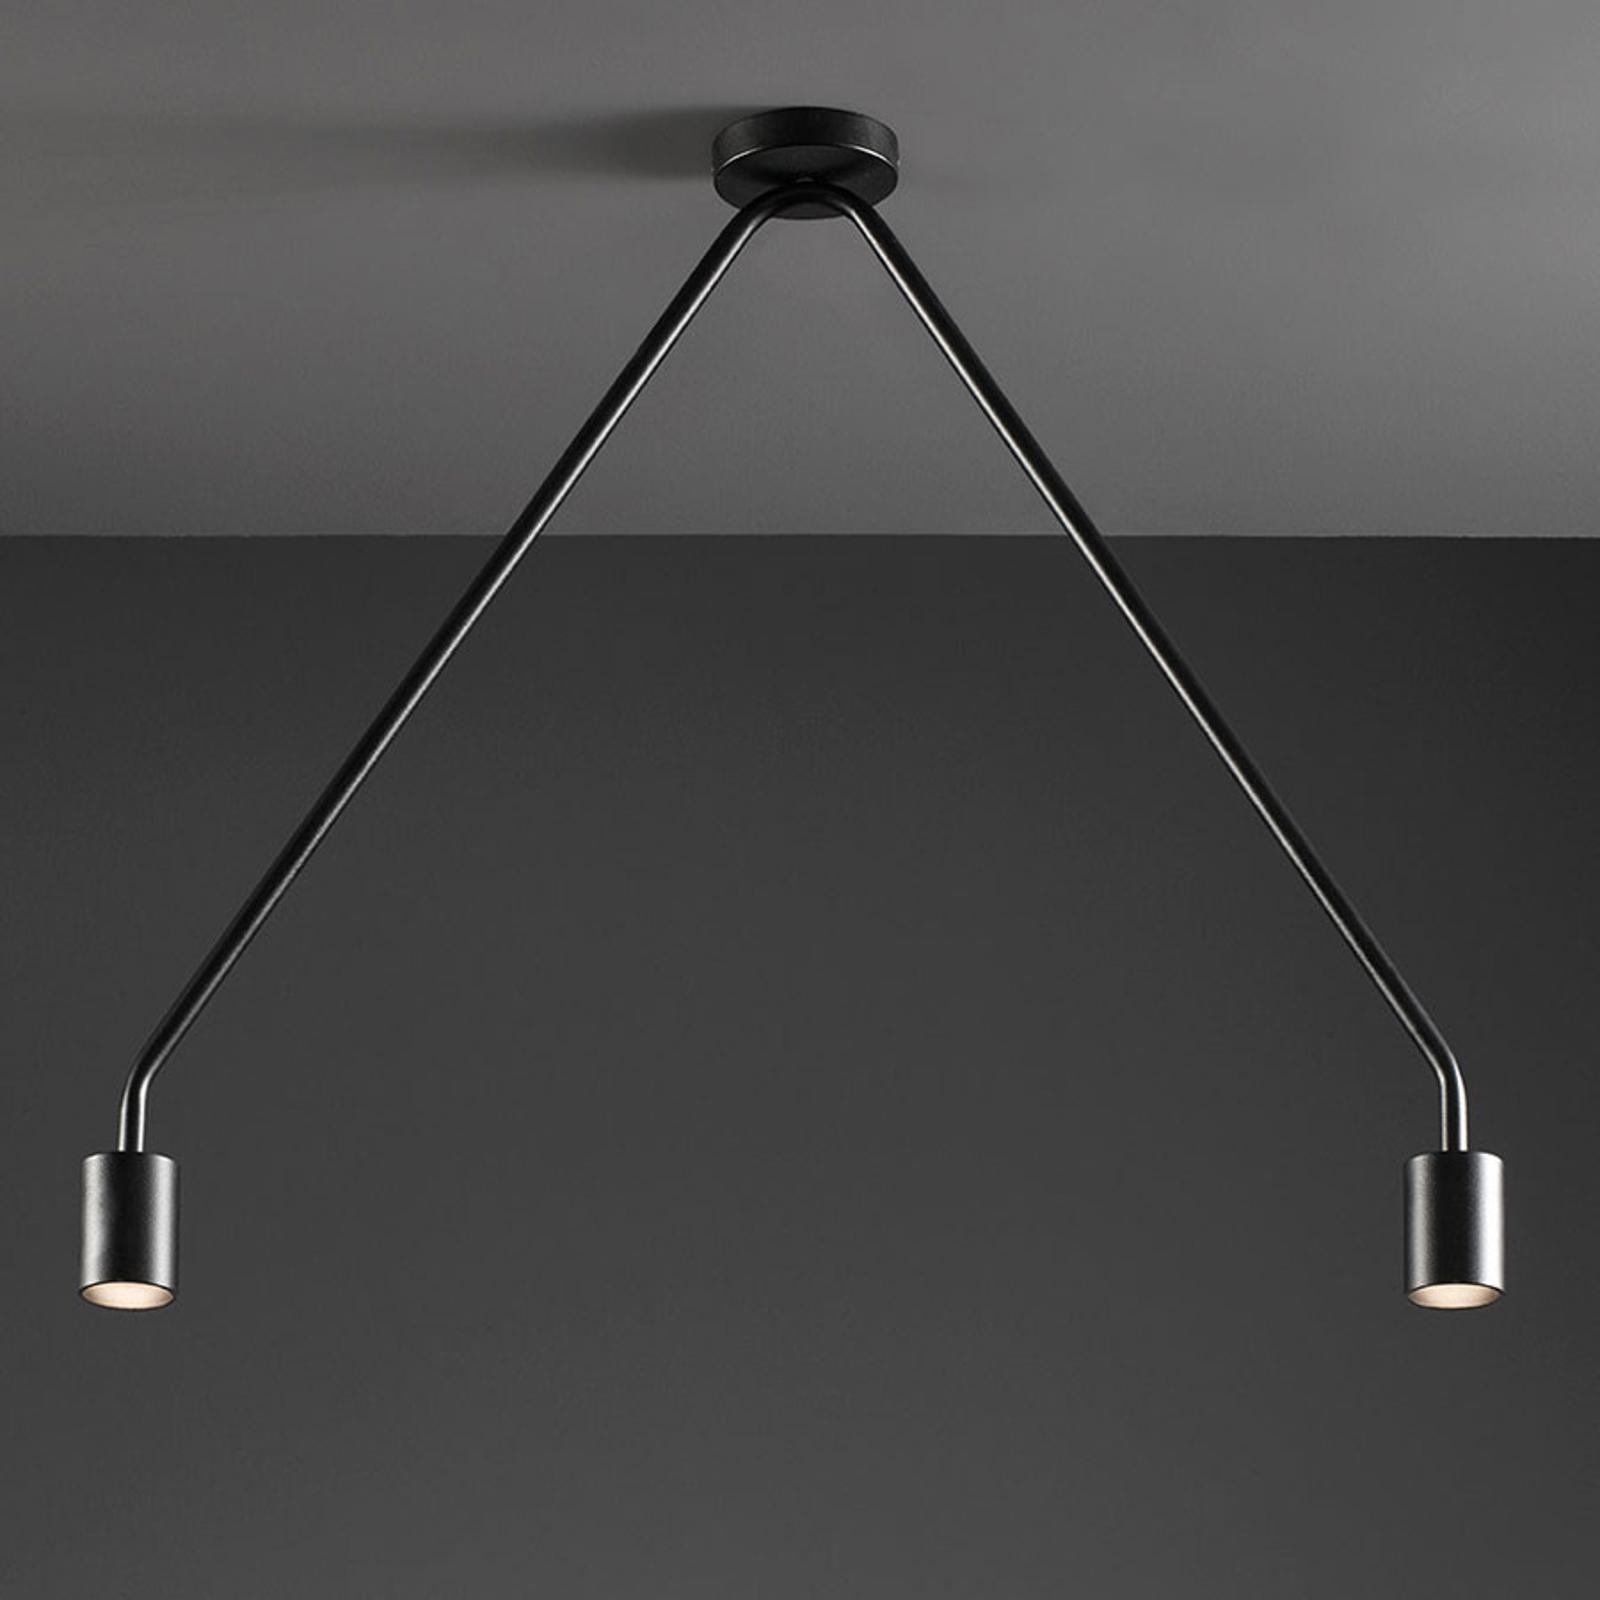 LED plafondlamp Caos in zwart, 2-lamps